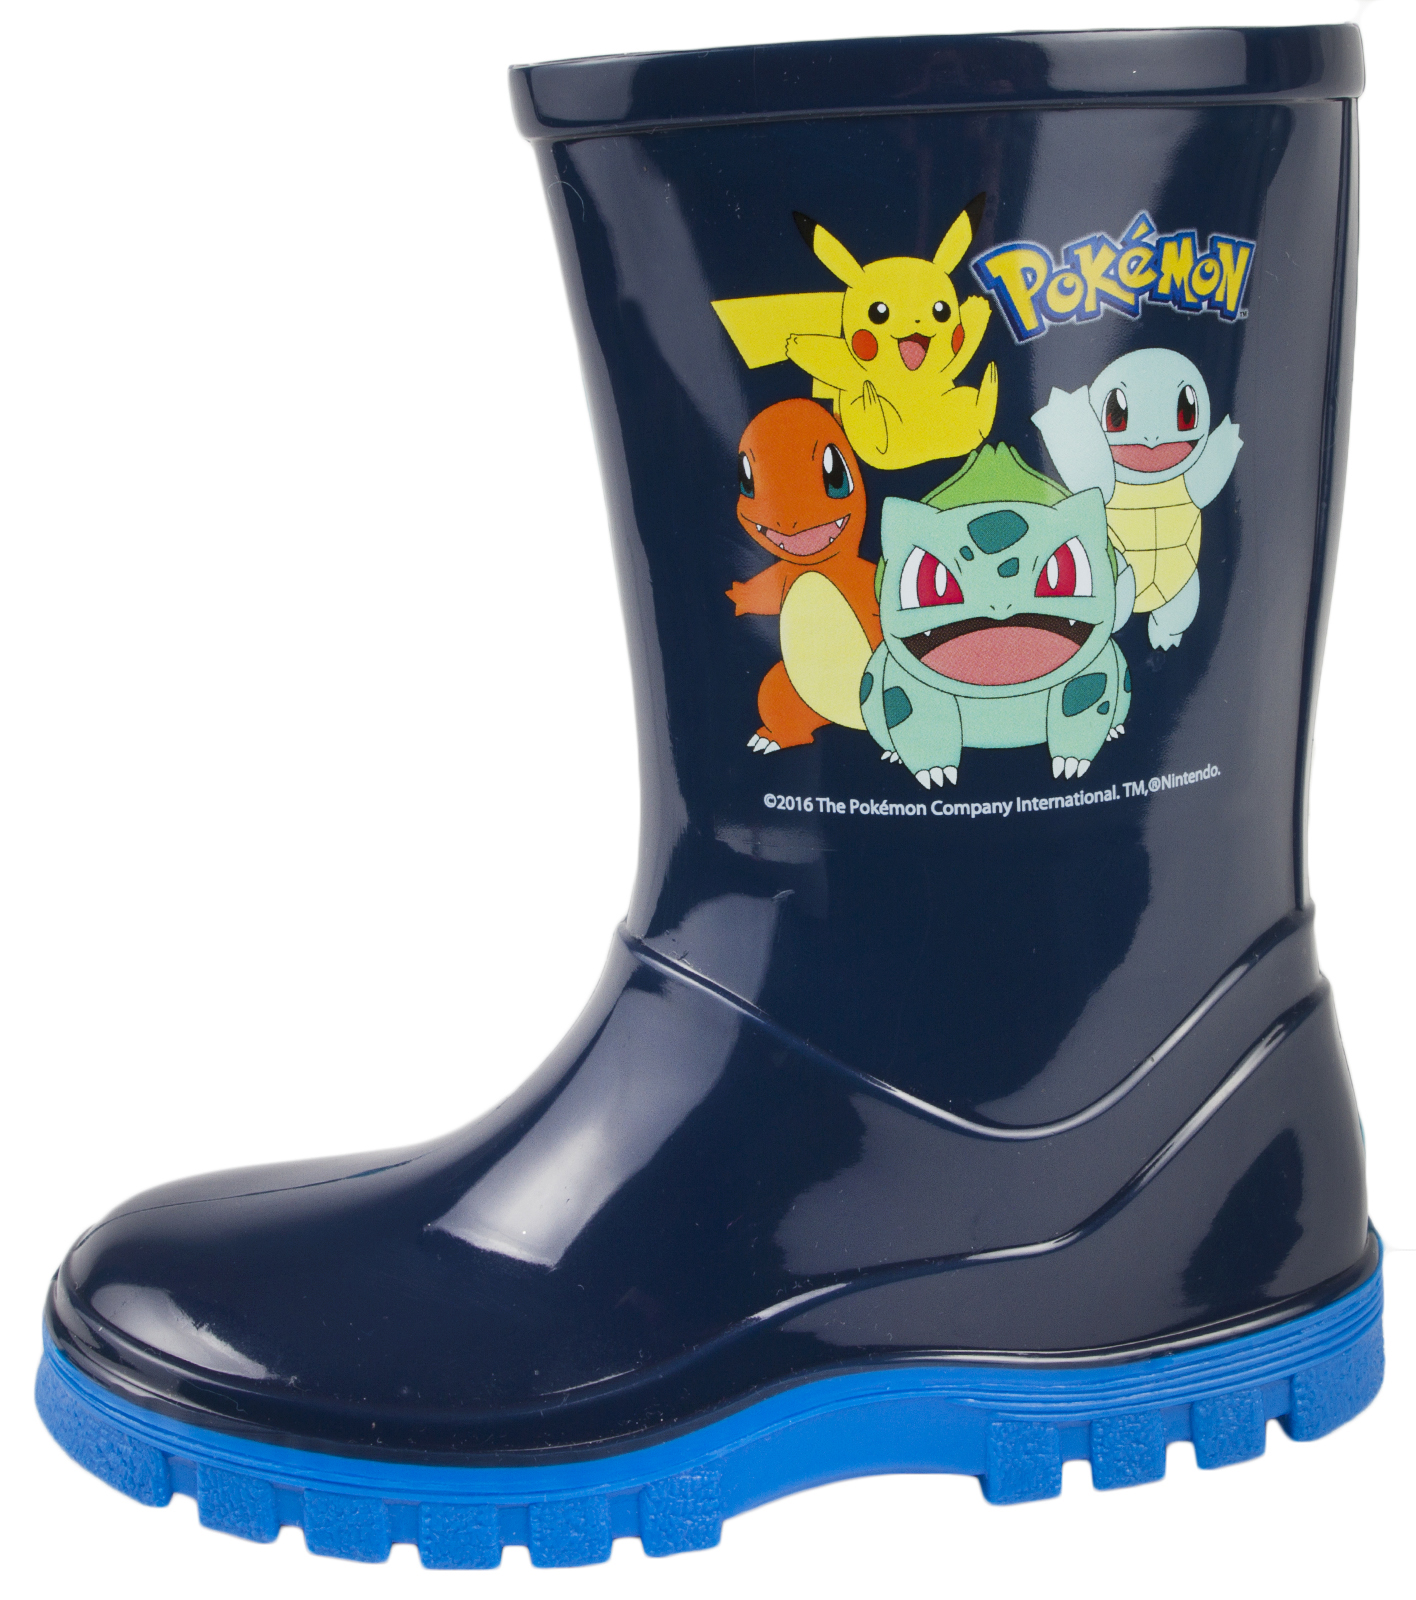 Chicos Botas Wellington Pokemon Pikachu Zapatos para Nieve Bulbasaur Charmander Squirtle